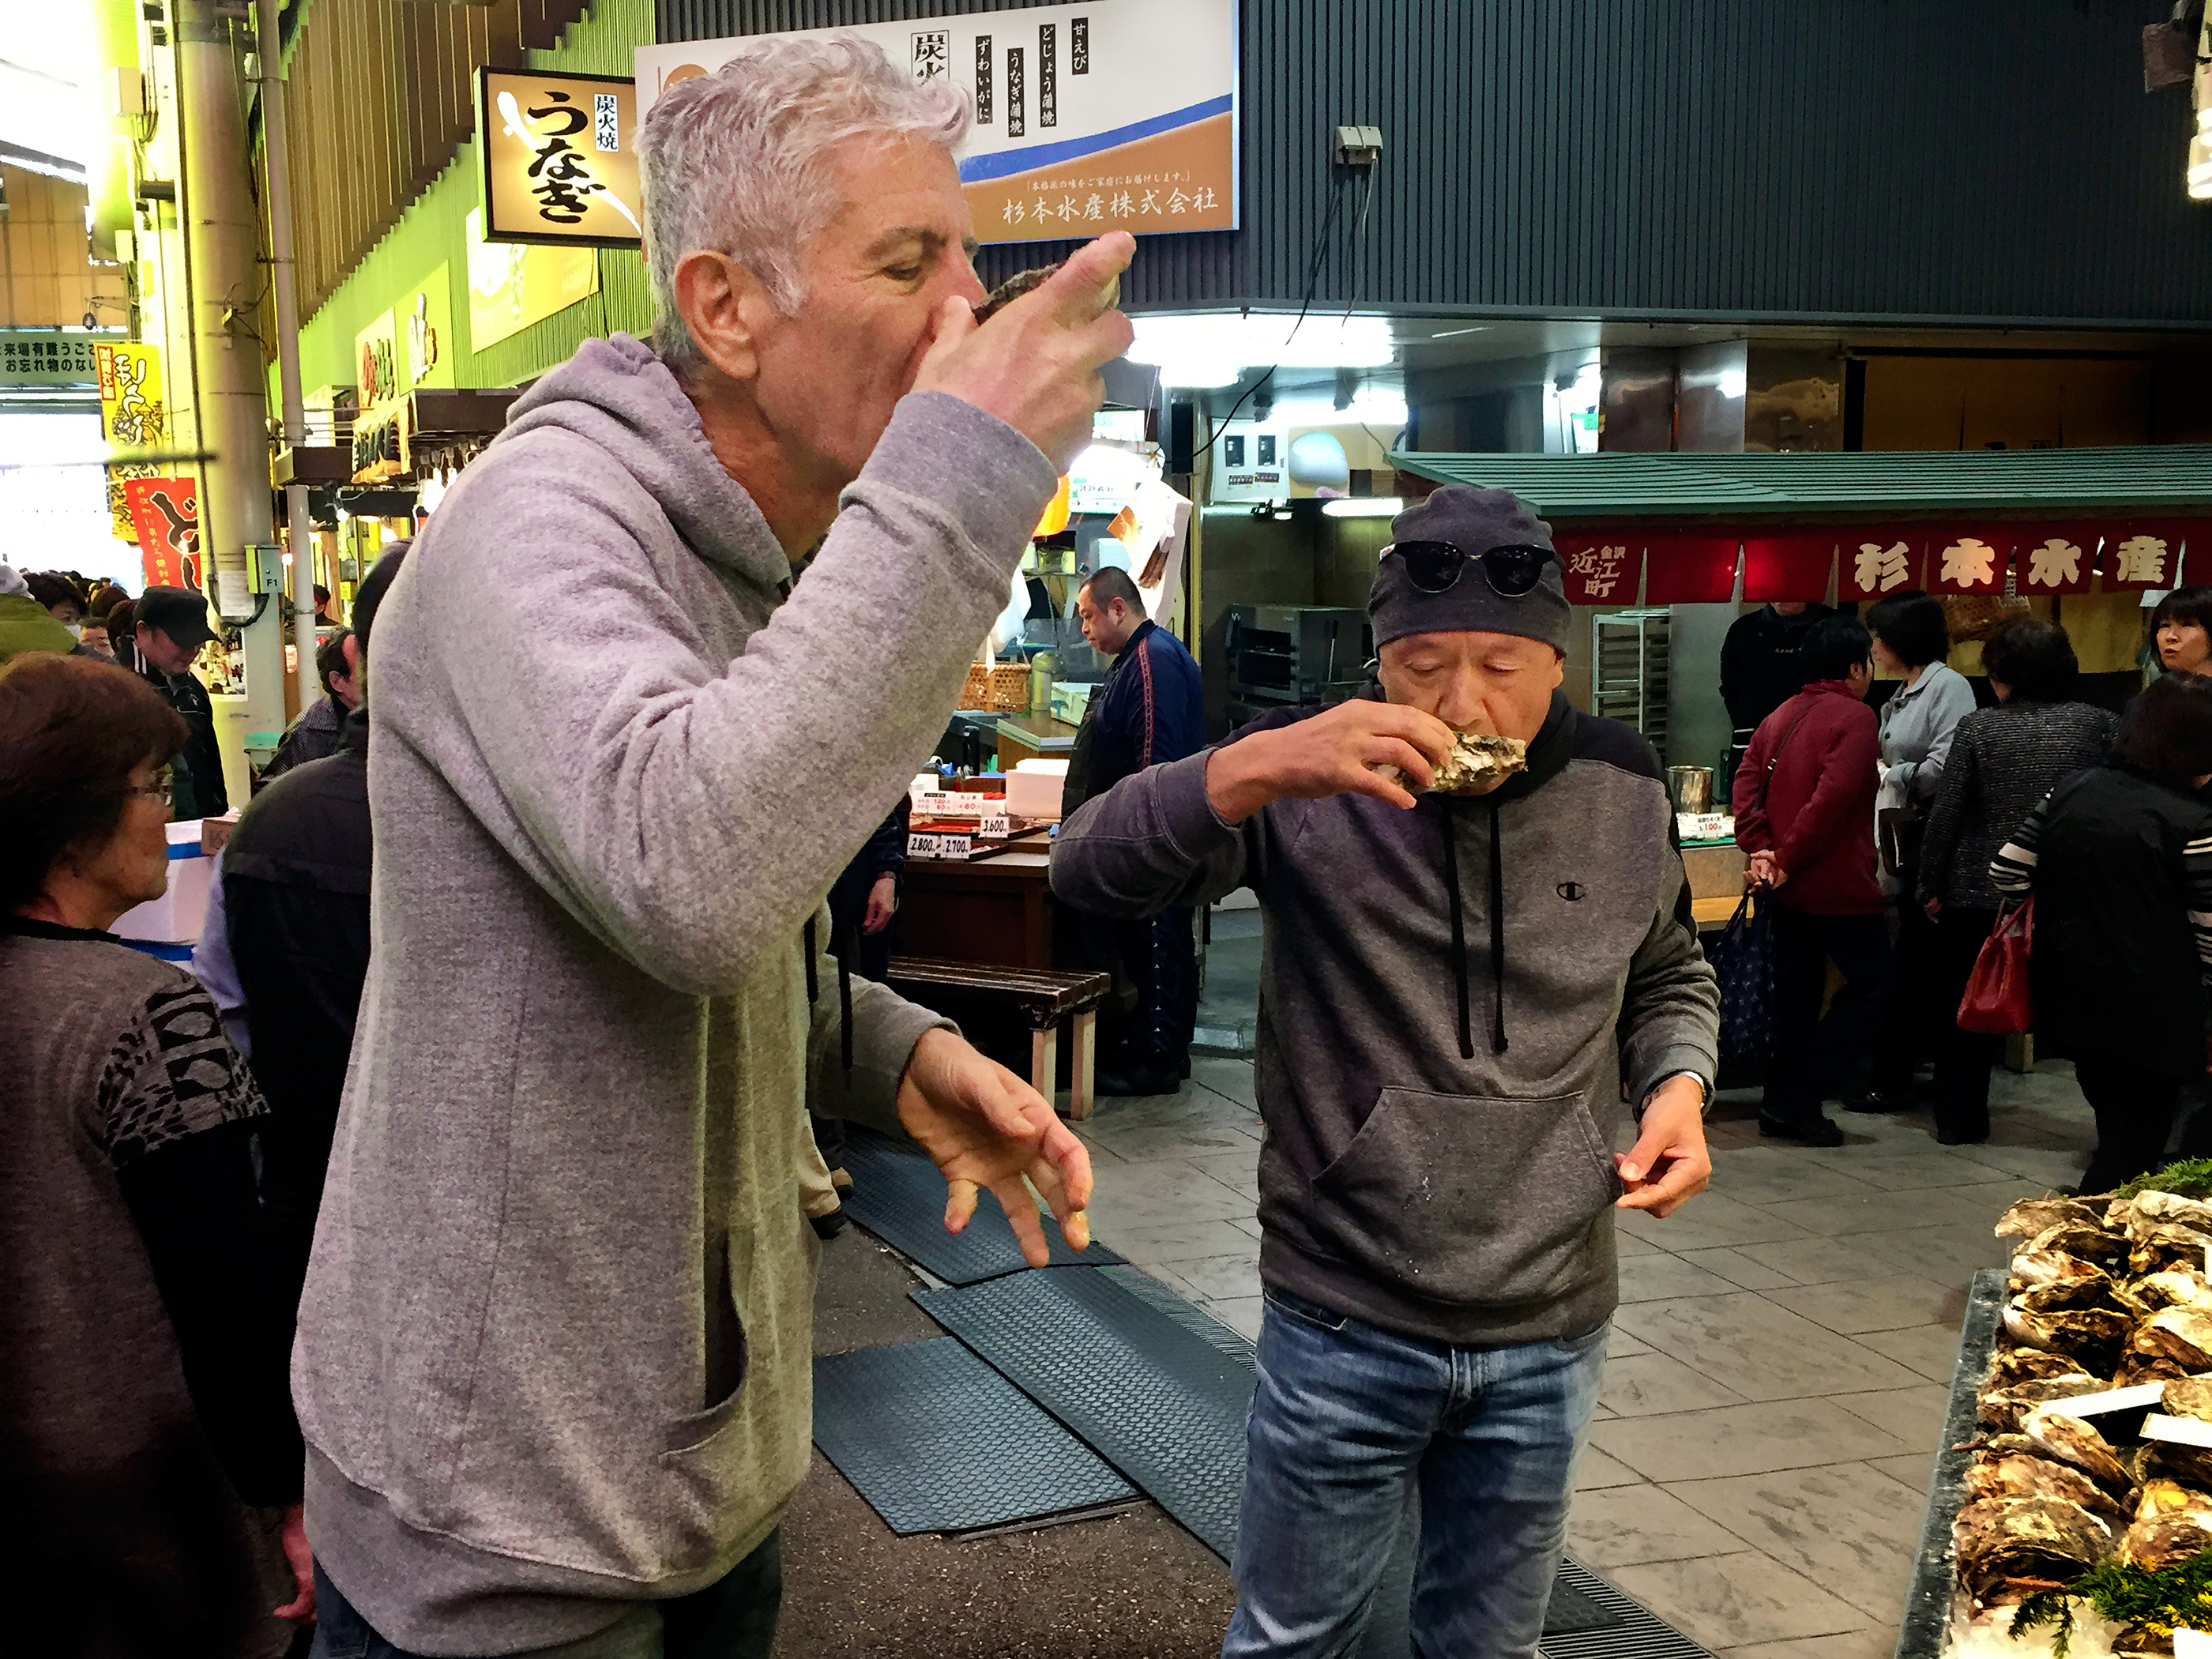 Anthony Bourdain and chef Masa Takayama sample oysters in the streets of Kanazawa, Japan.